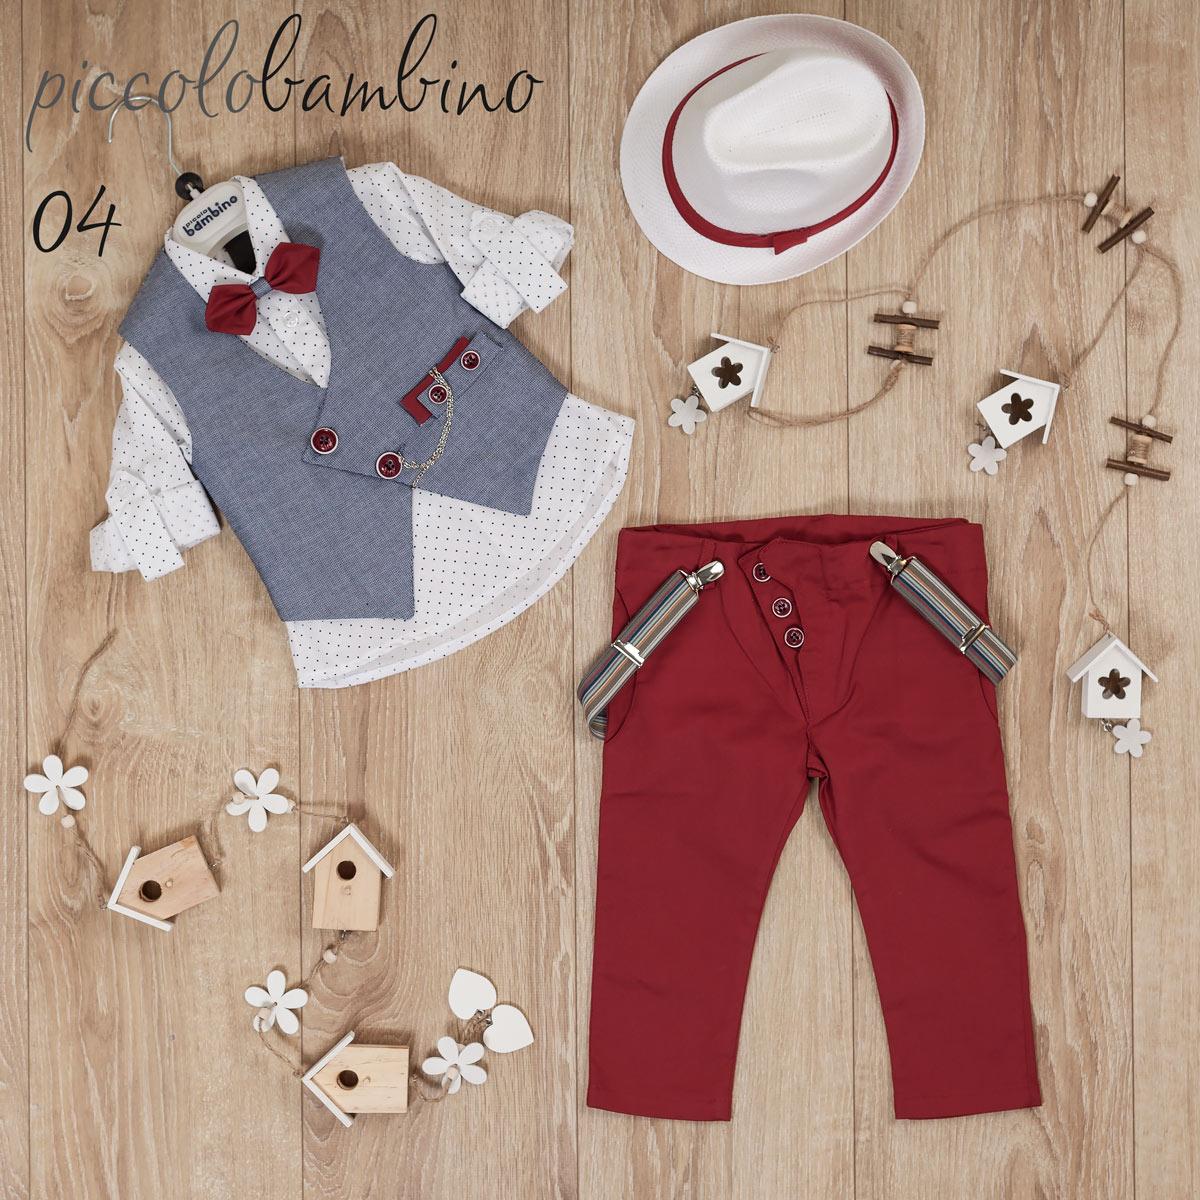 4ad4693a400 αγόρι – Picolo bambino βαπτιστικα ρουχα christening clothes